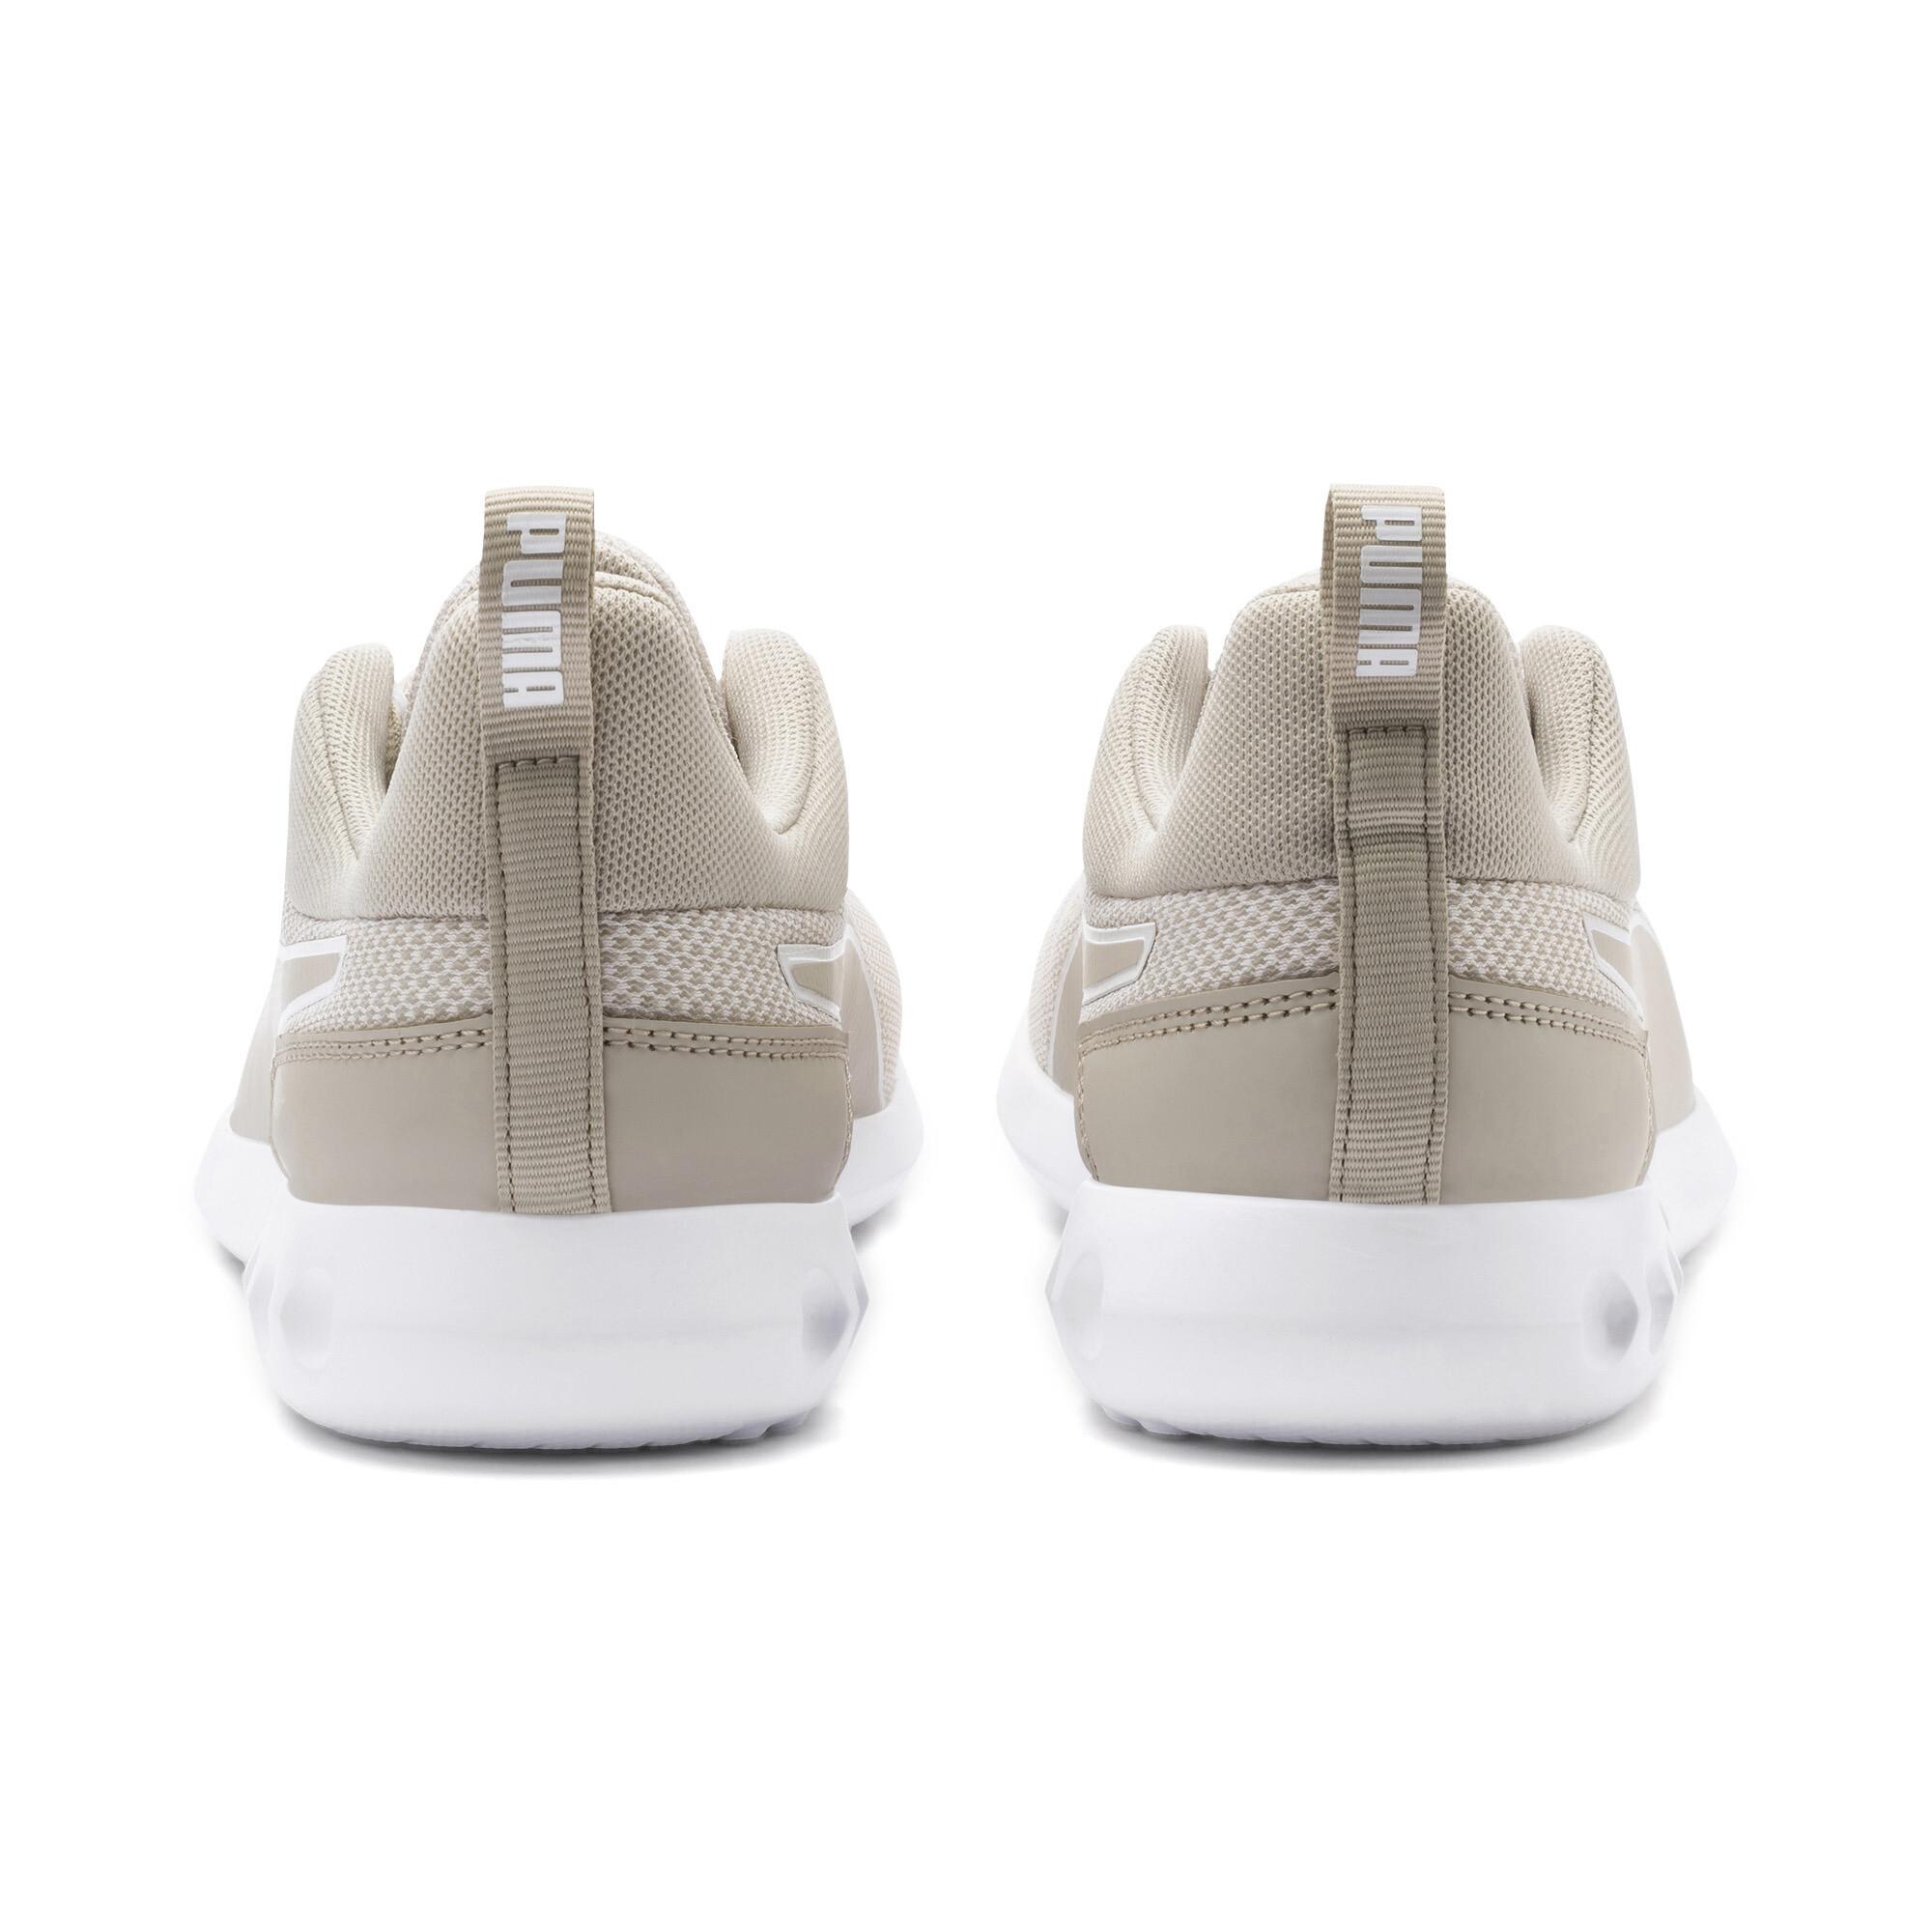 PUMA-Carson-2-Concave-Women-s-Training-Shoes-Women-Shoe-Running thumbnail 3